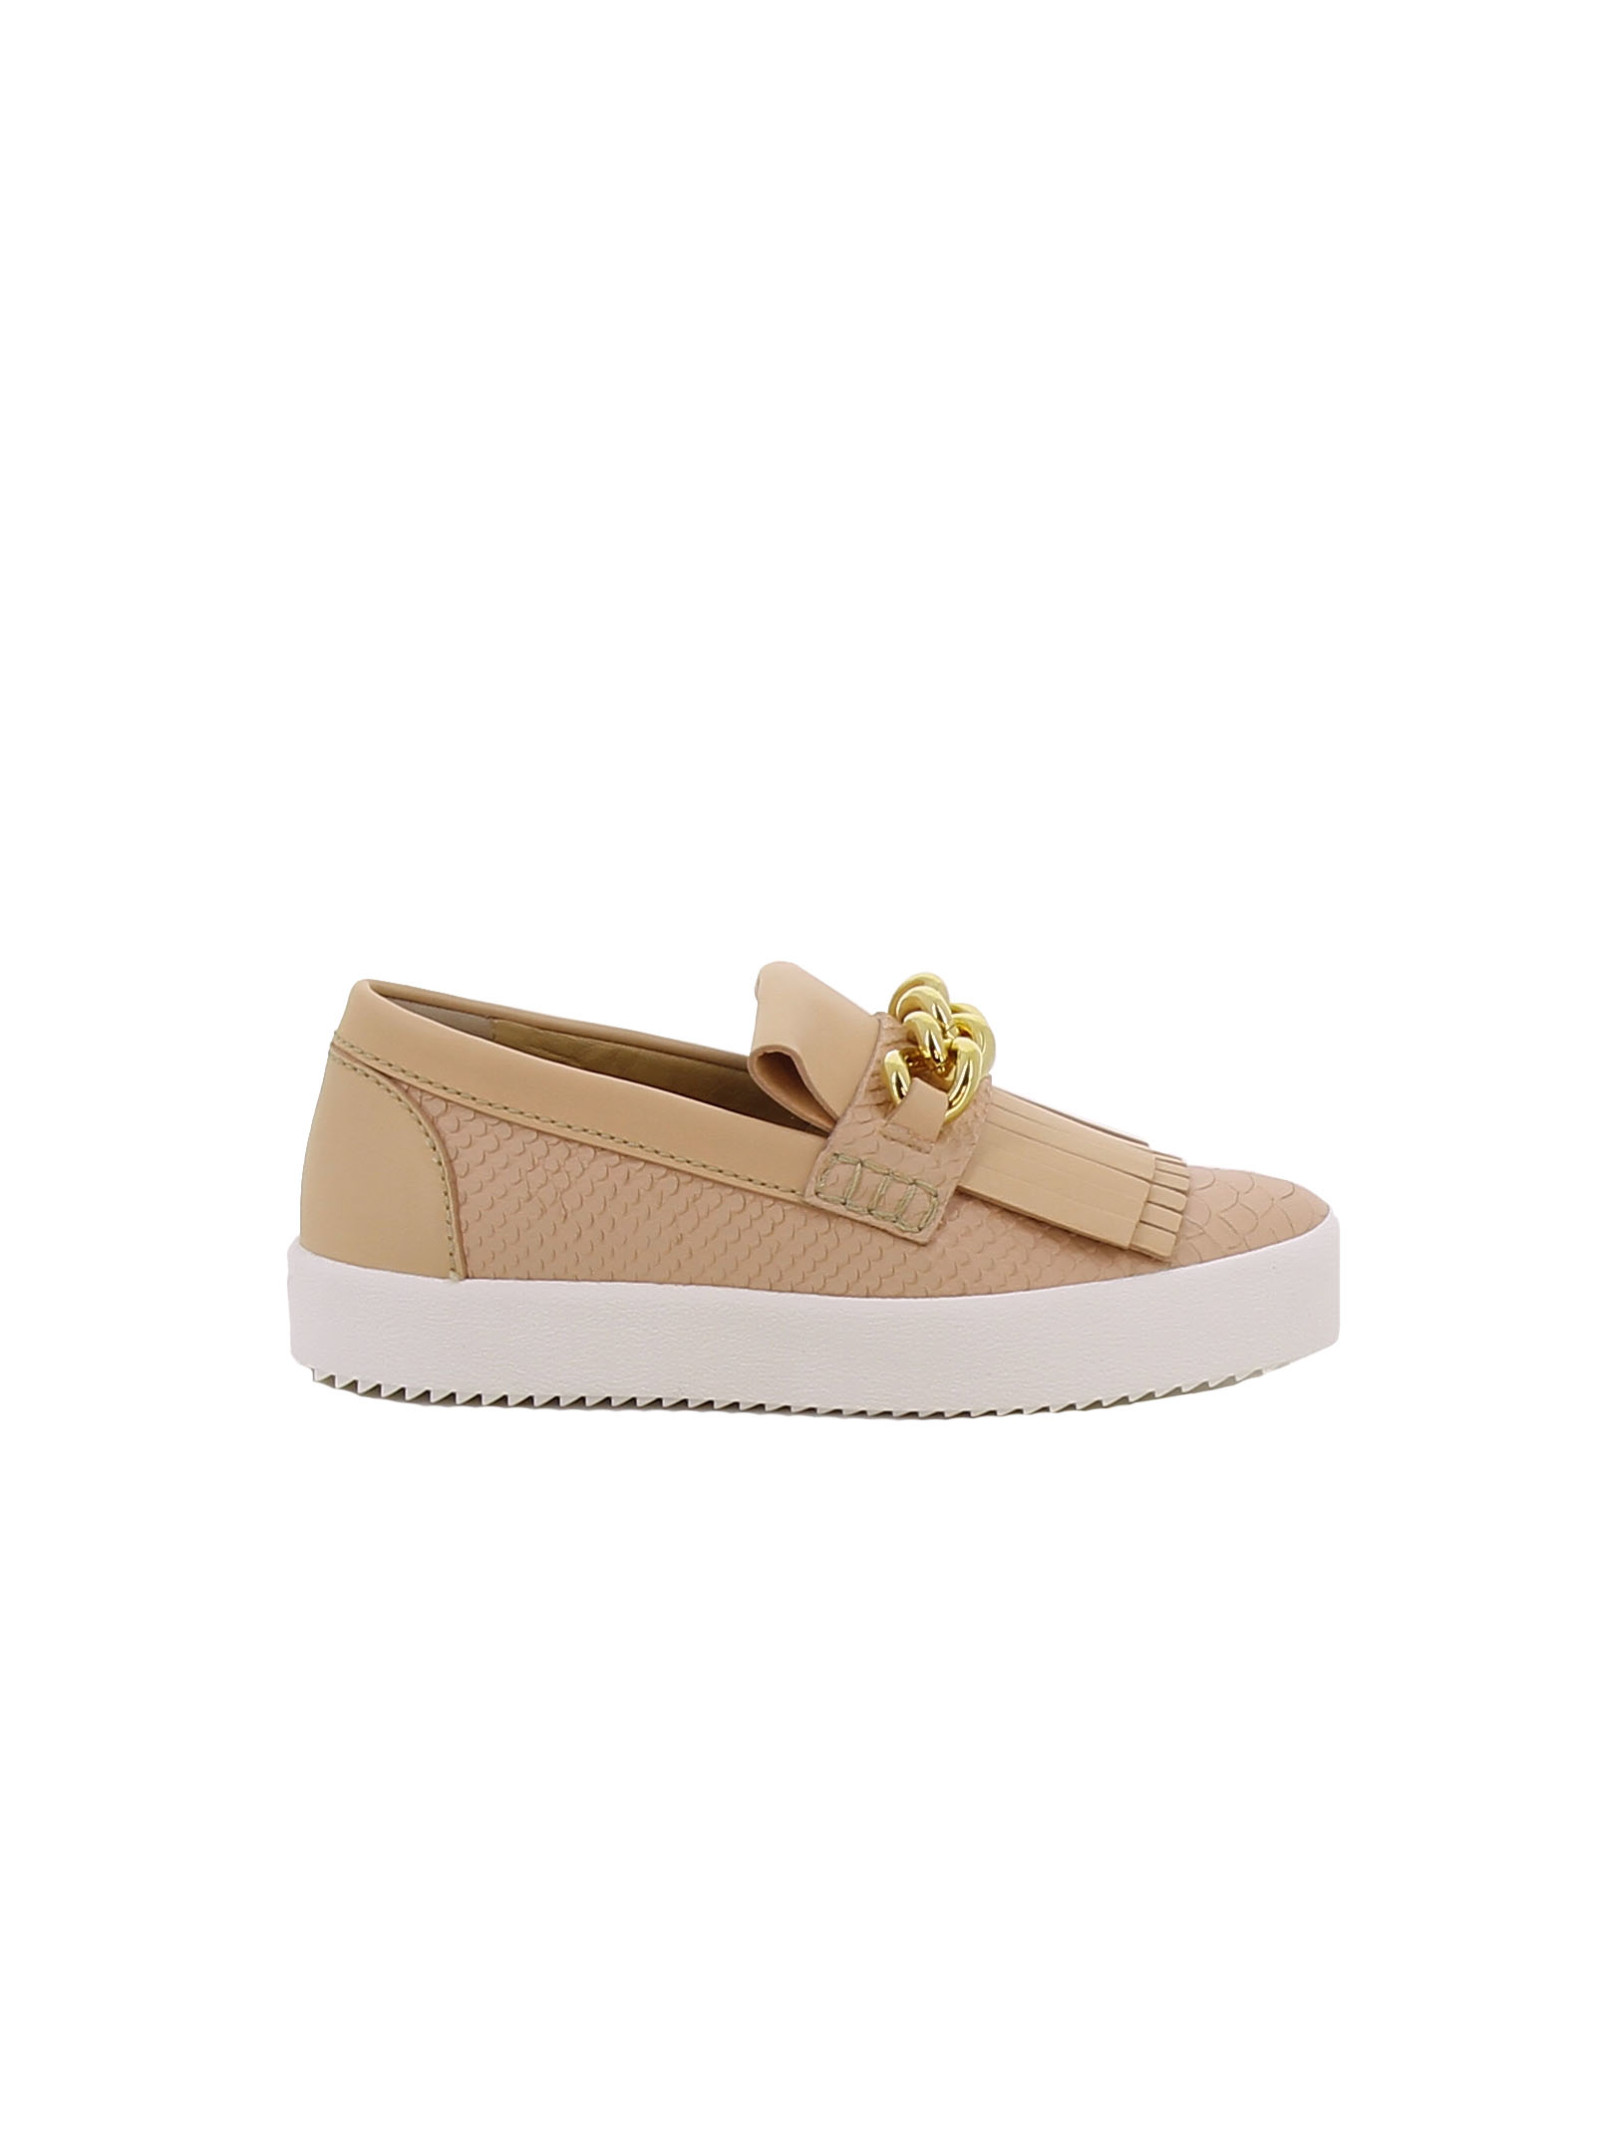 giuseppe zanotti female giuseppe zanotti may london slipon sneakers